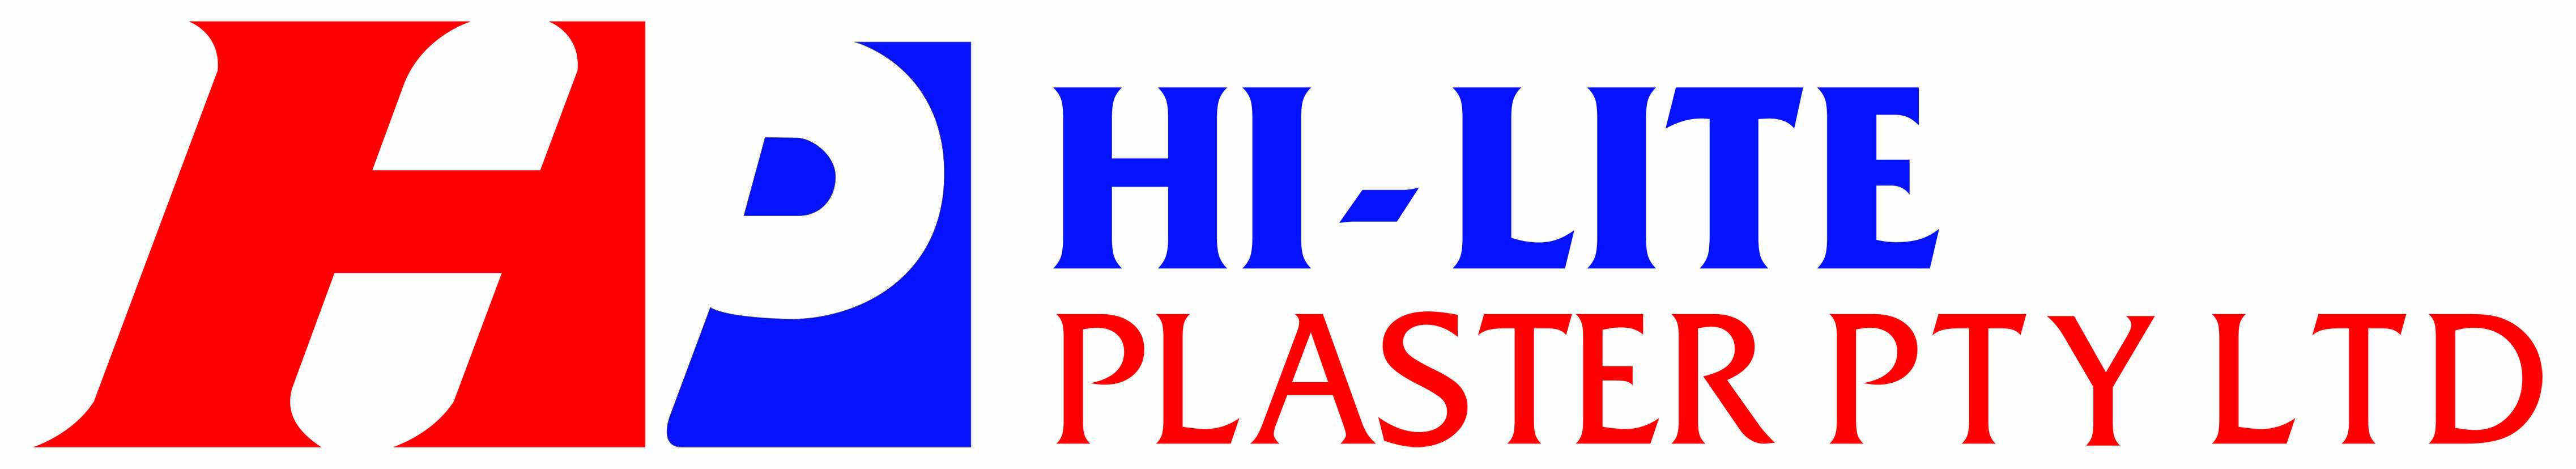 Hi-Lite Plaster